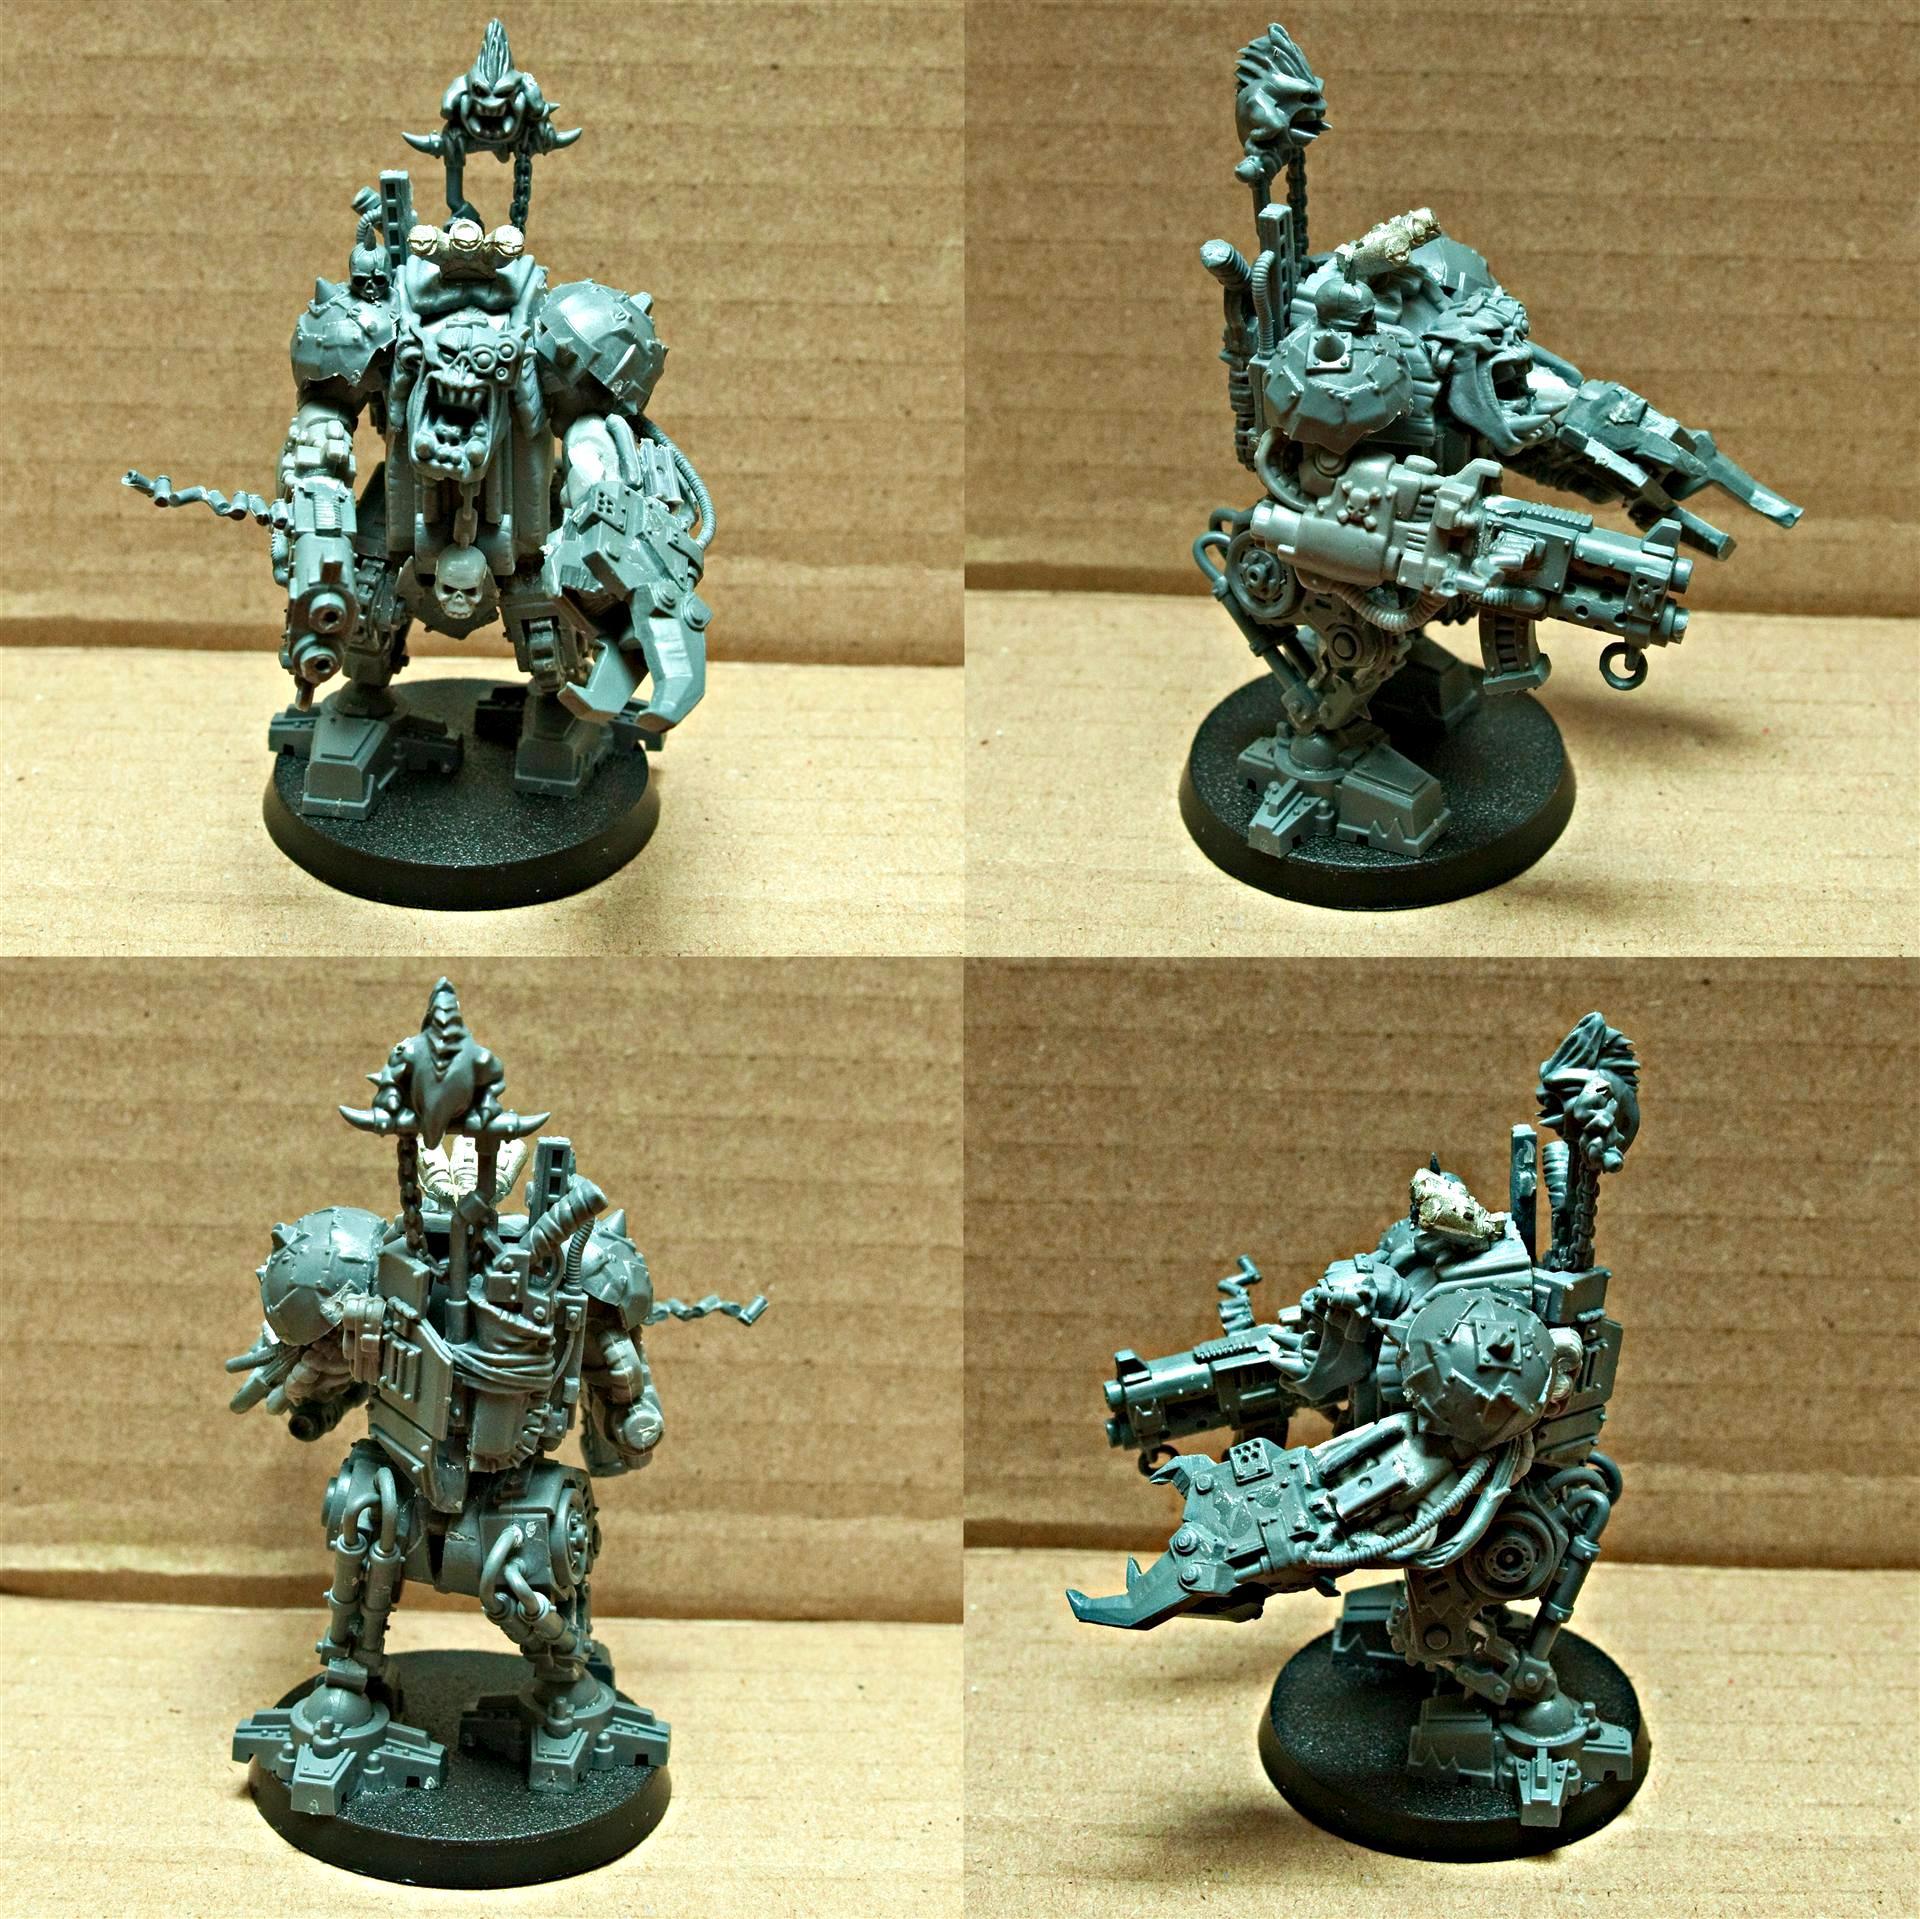 Goff, Goffs, Mega, Mega-armor, Mega-armored, Mega-armour, Orks, Squigs, Warboss